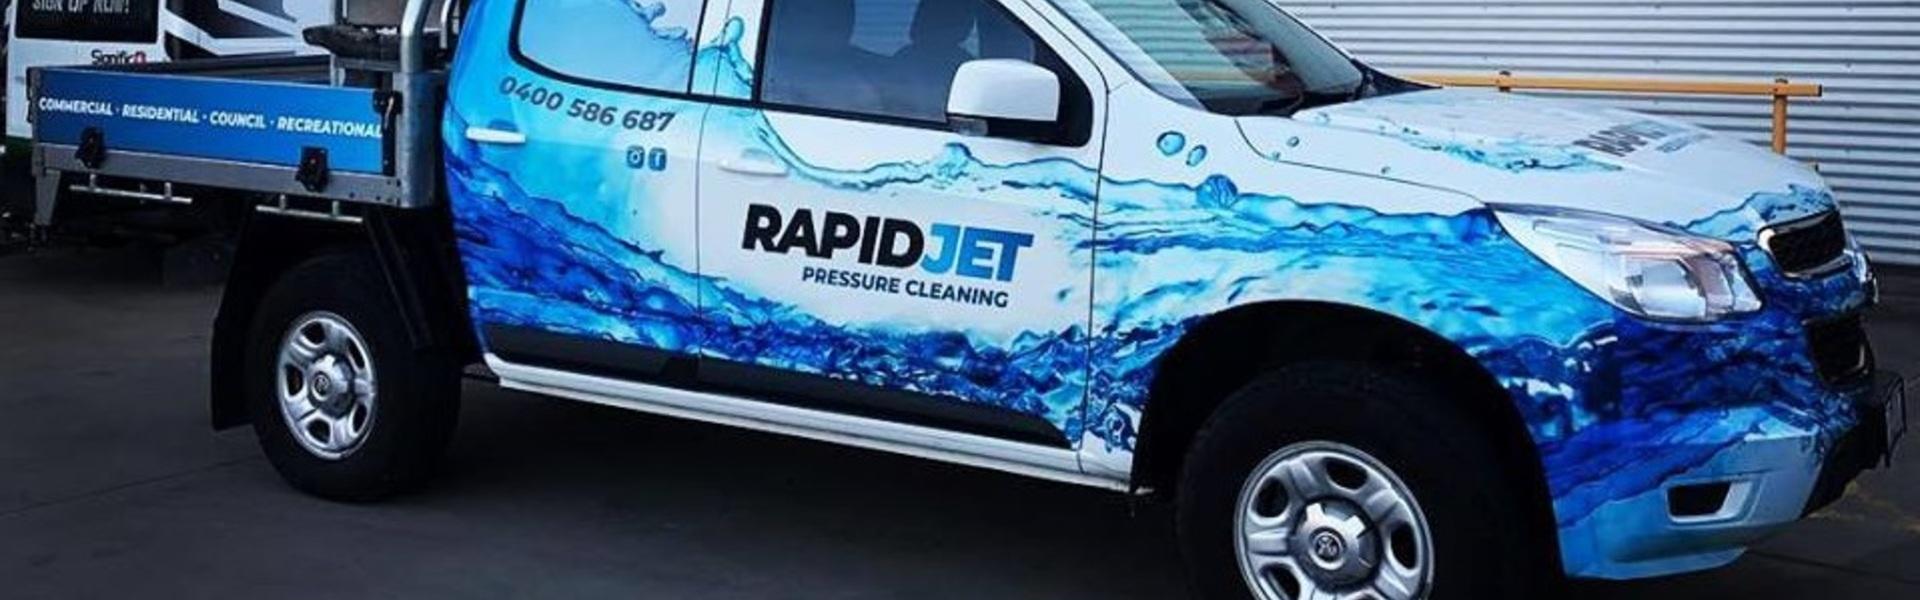 Rapid_Jet_Pressure_Cleaning_Vehicle_in_Ballarat.jpg